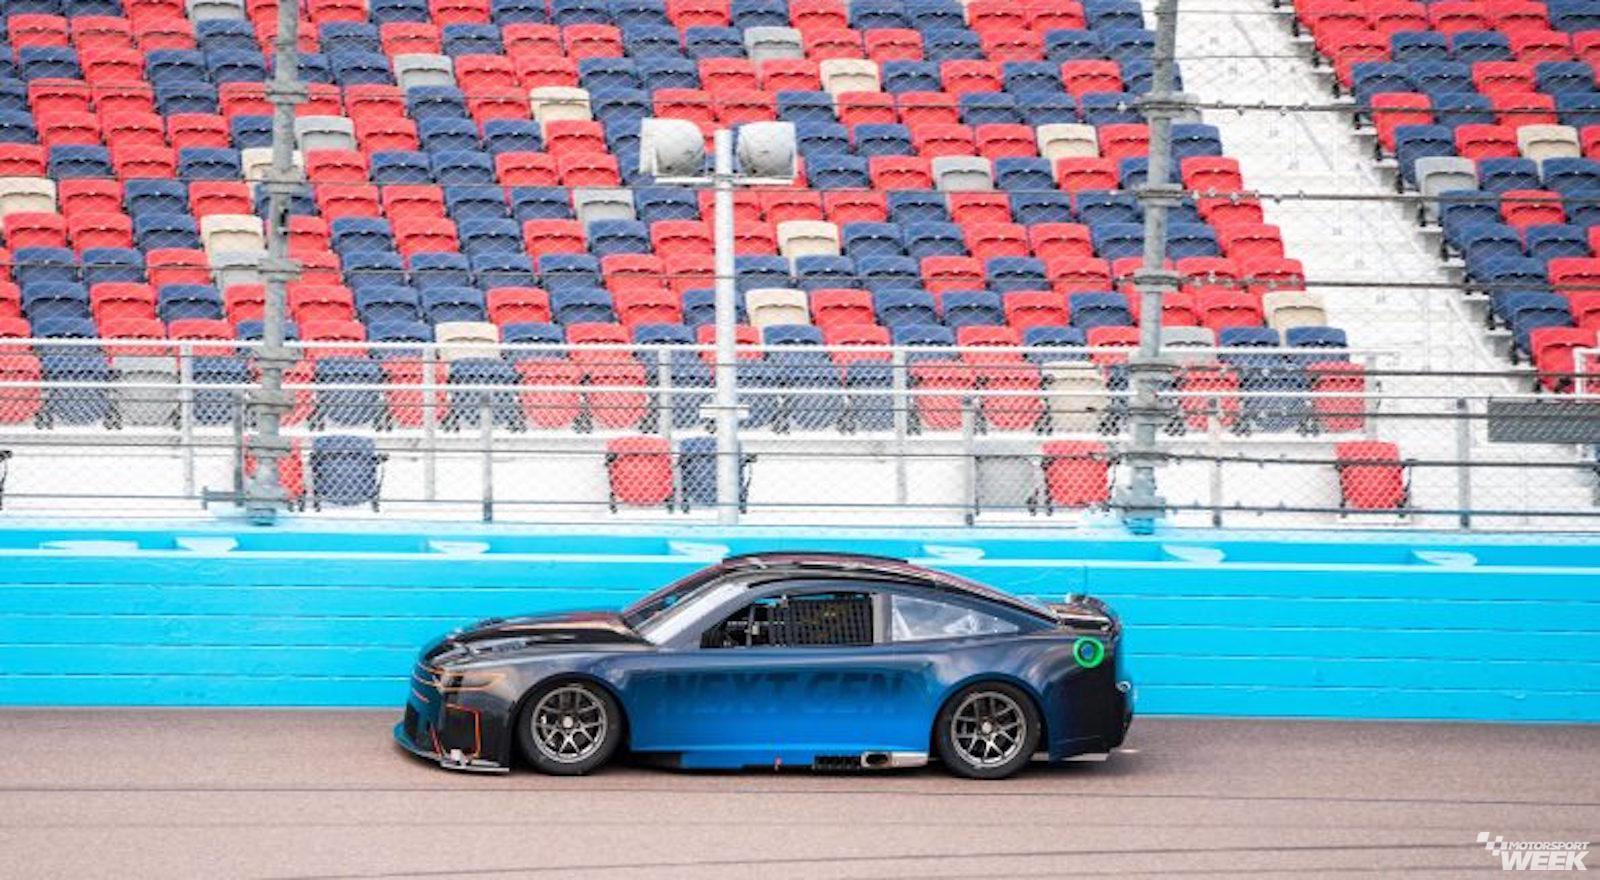 Nascar: Joey Logano likes challenge of Next Gen race car after ISM Raceway test – Motorsport Week